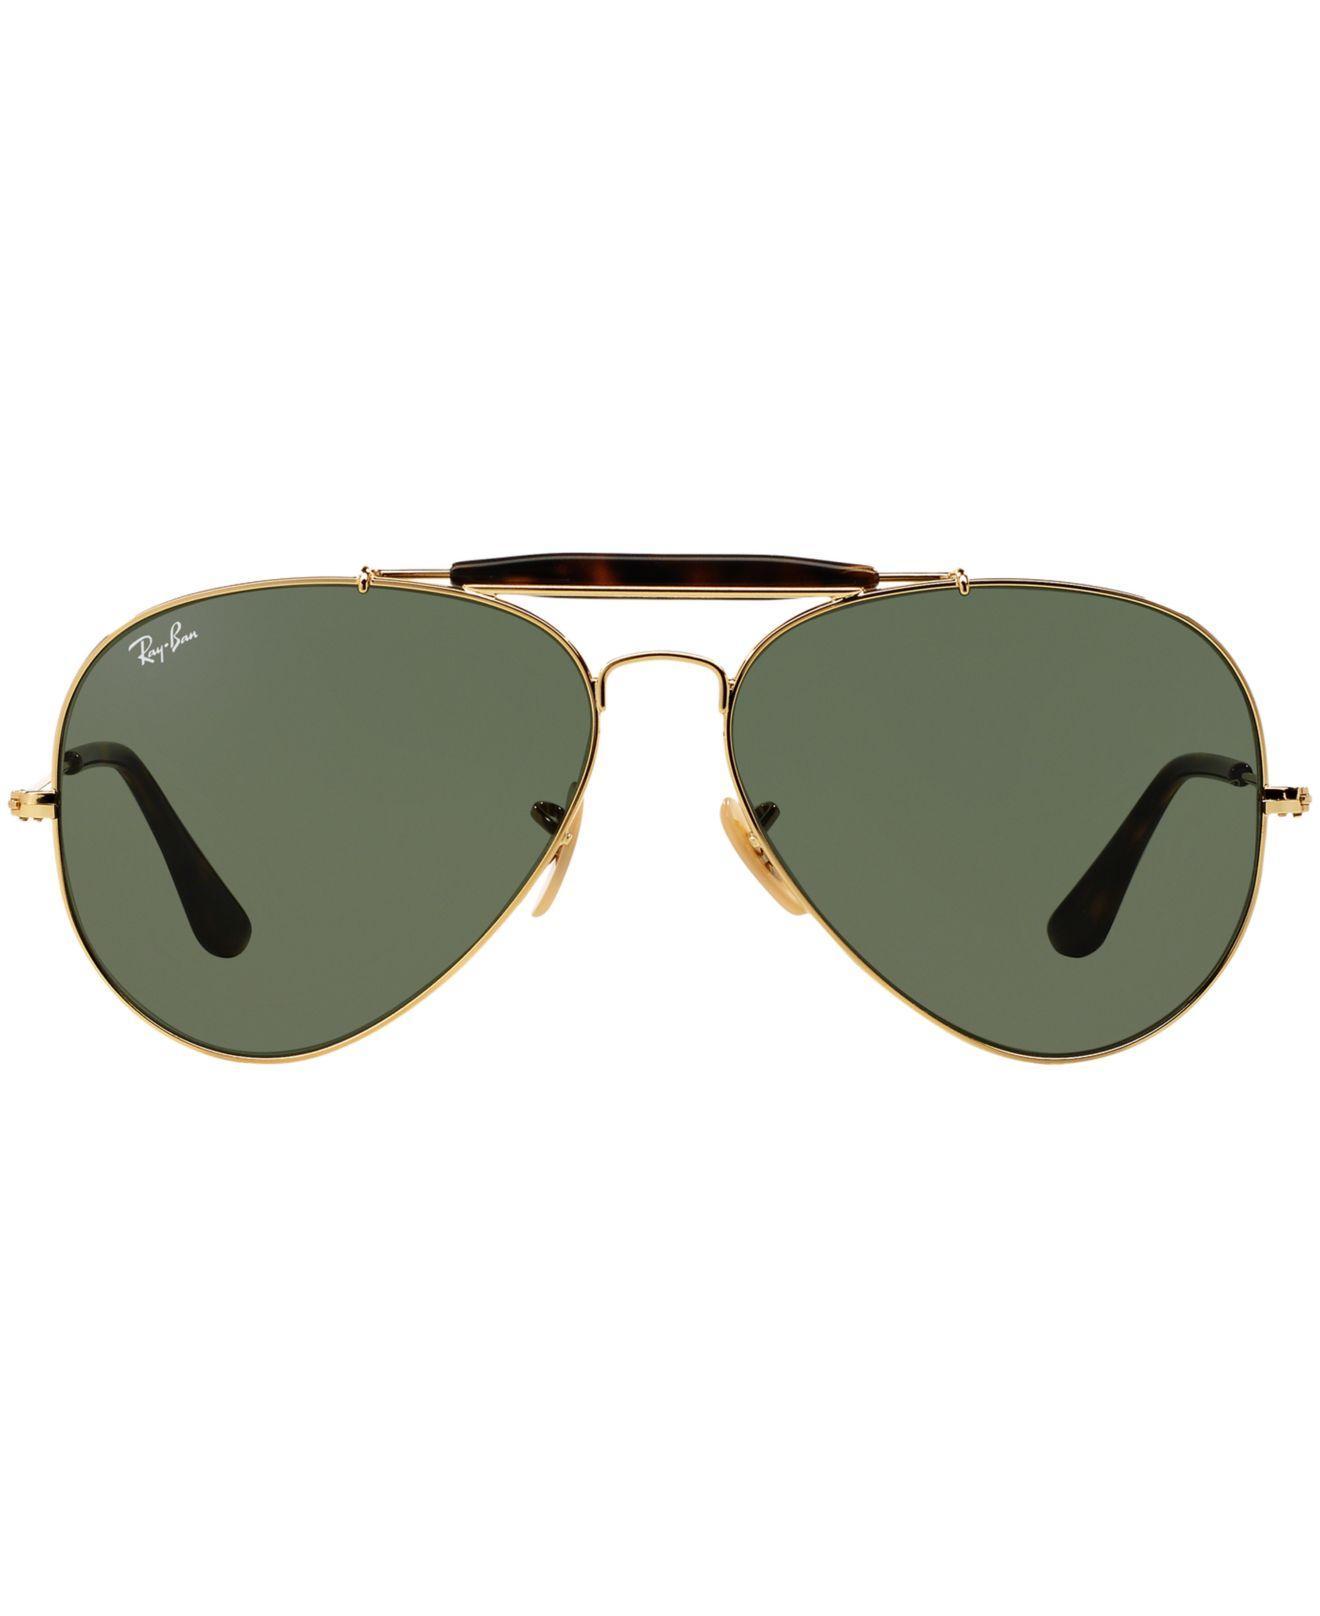 869e1b4a39 Lyst - Ray-Ban Sunglasses